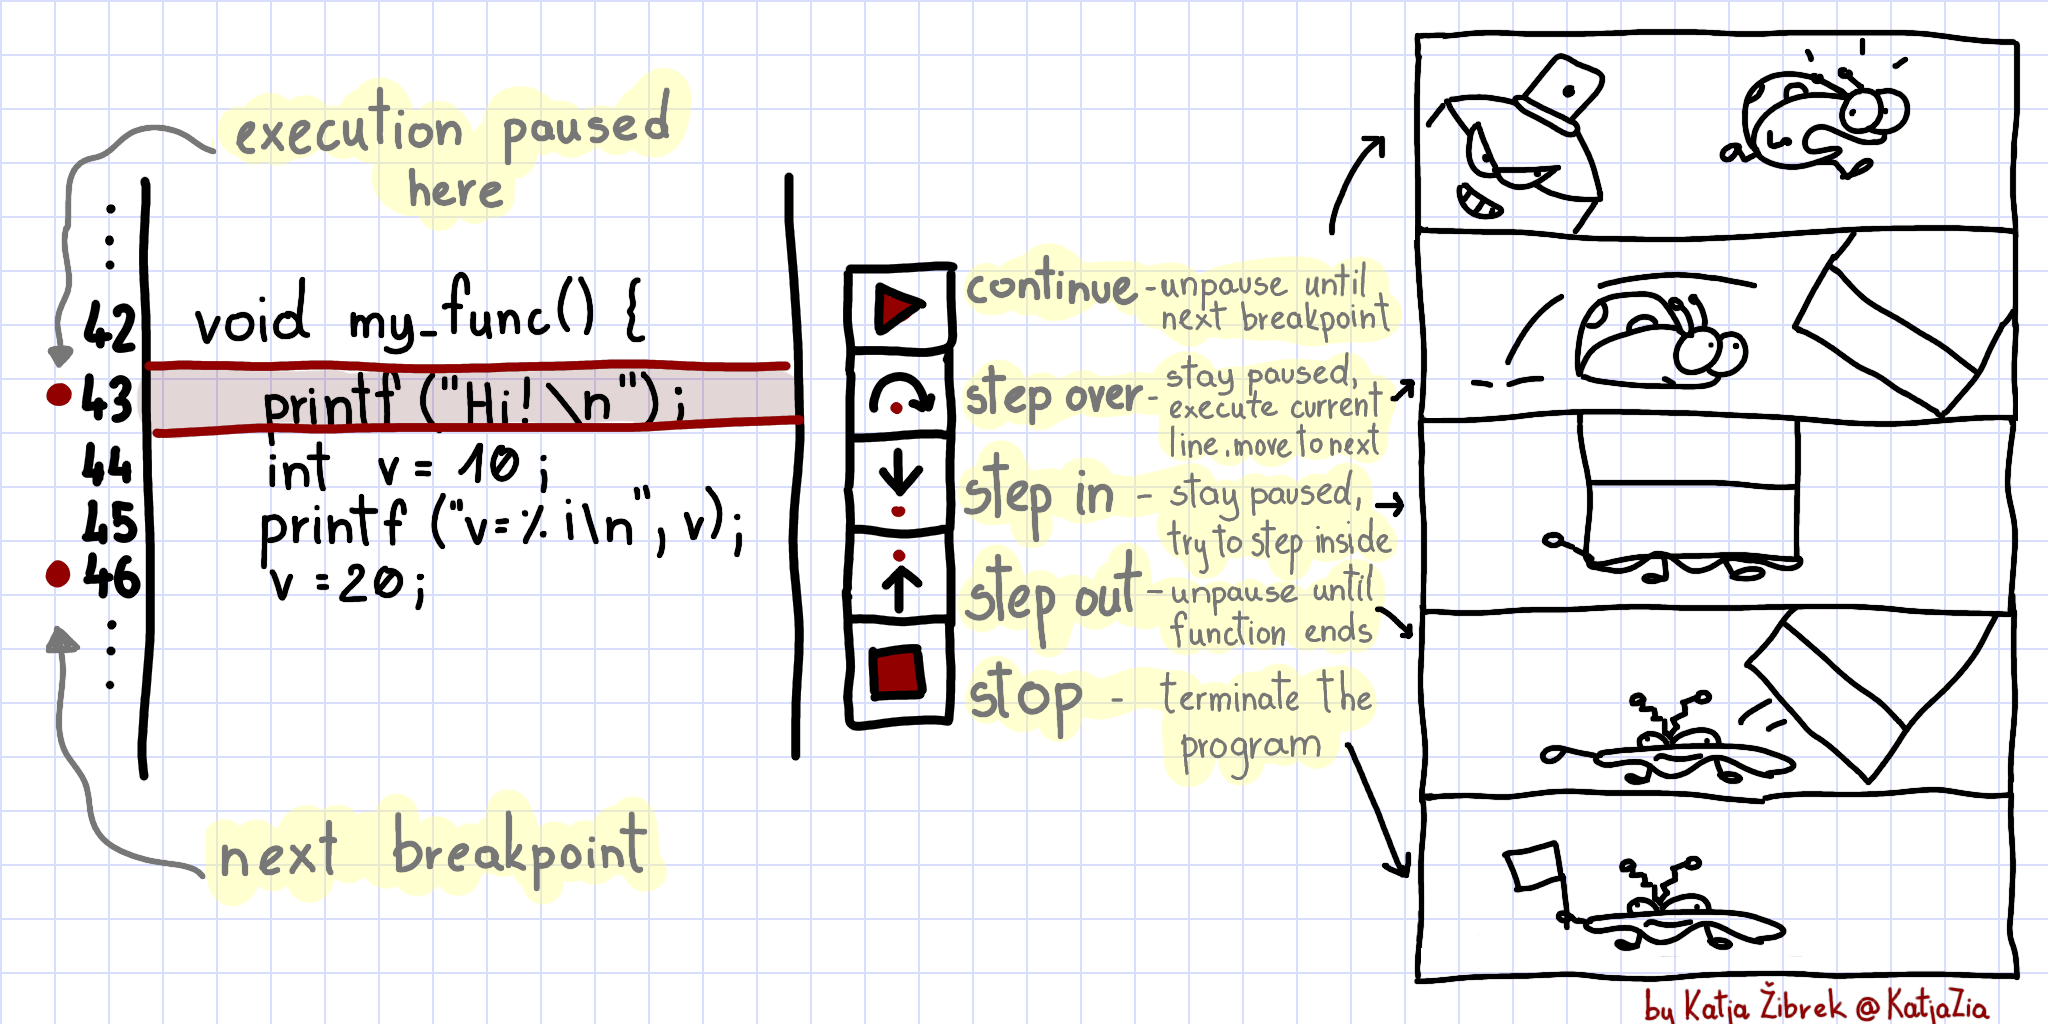 Cartoon guide to using an integrated visual debugger.